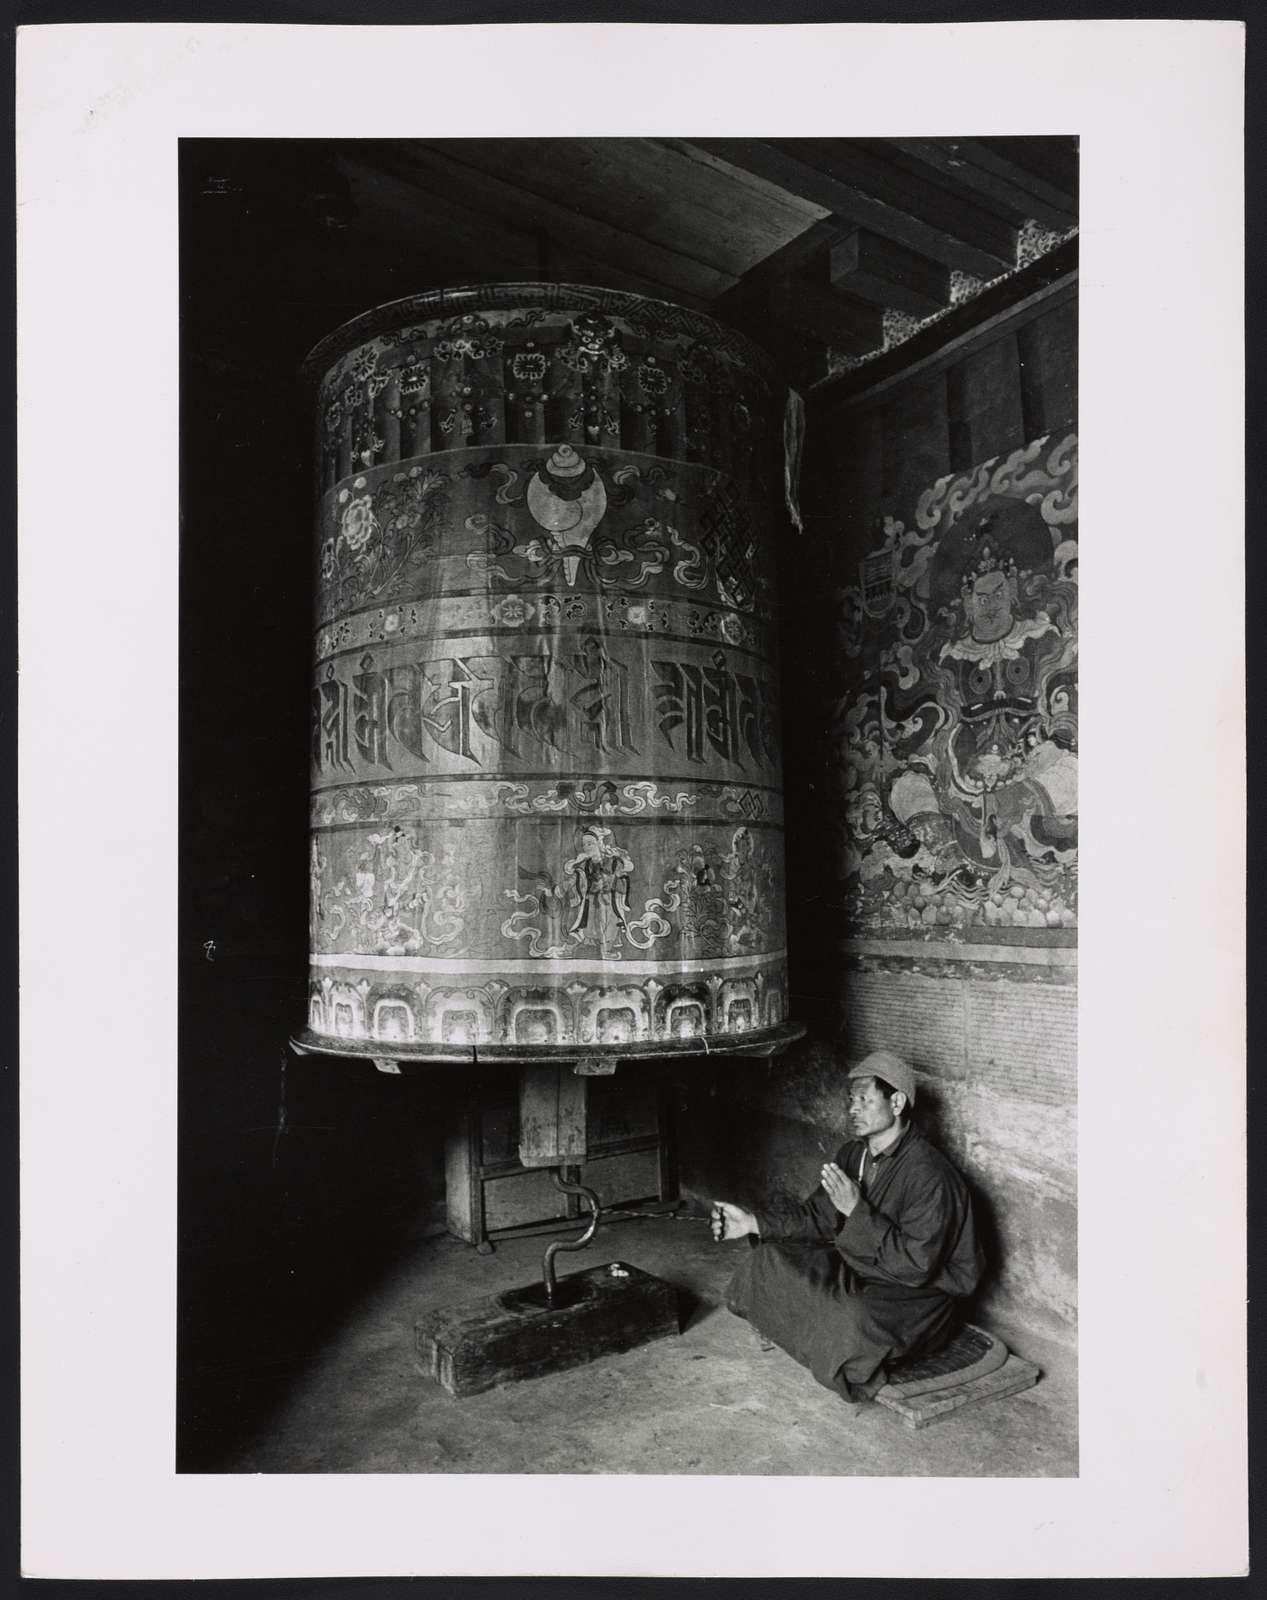 Lama and prayer wheel / Alice S. Kandell.